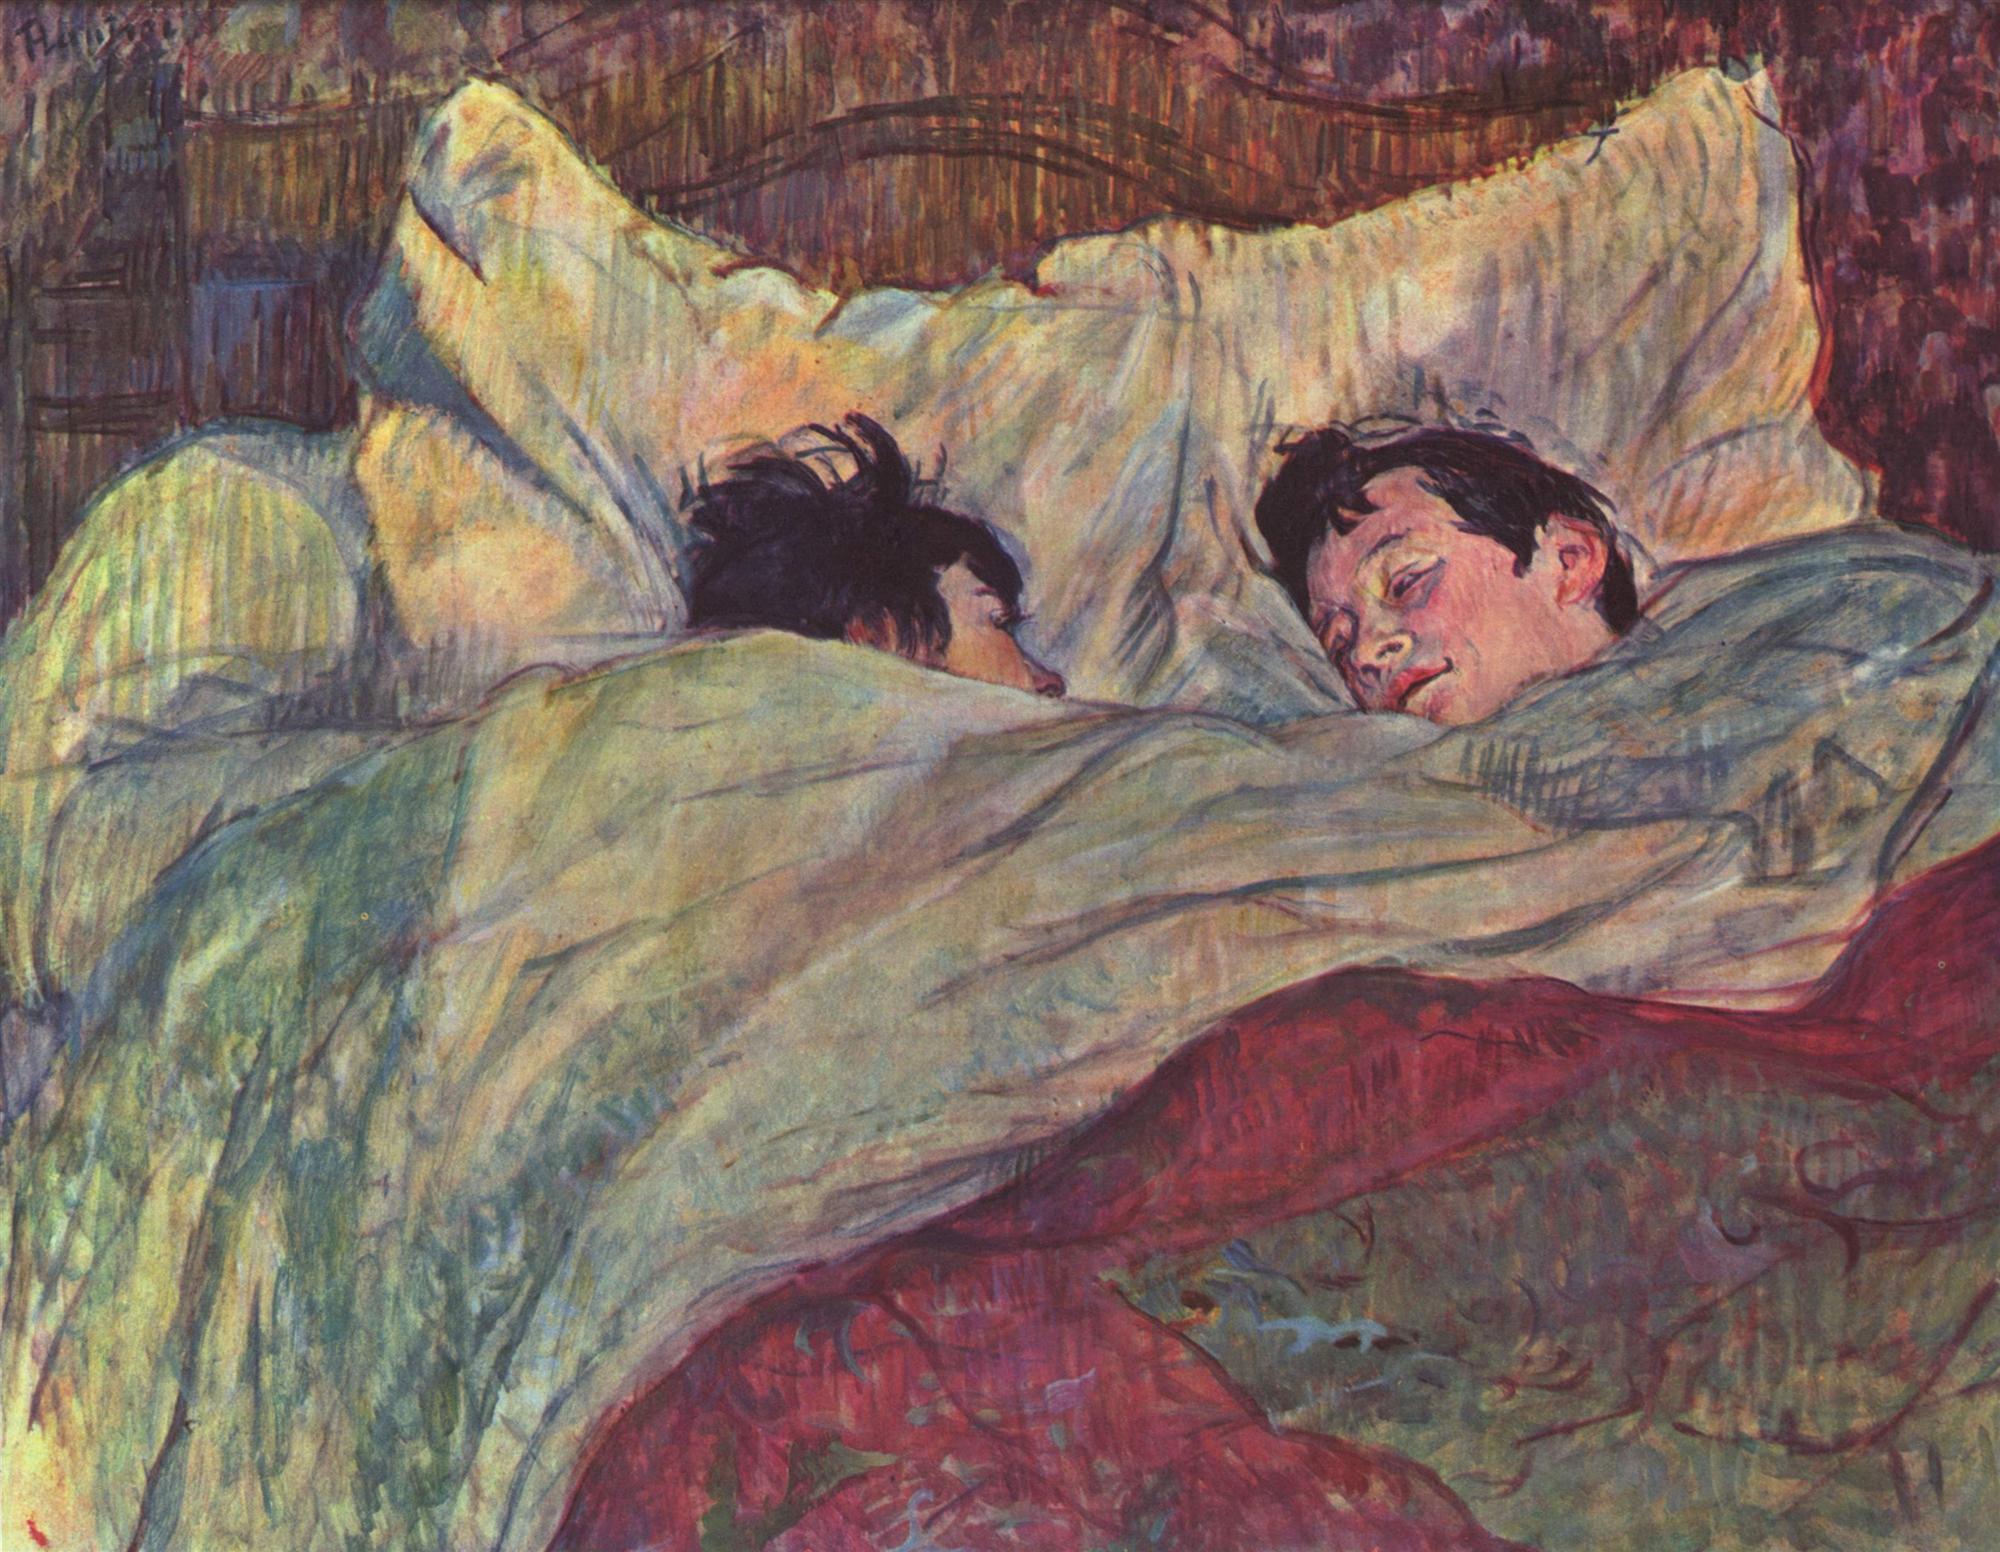 Impresionismo .. La-cama-henri-de-toulouse-lautrec-1893